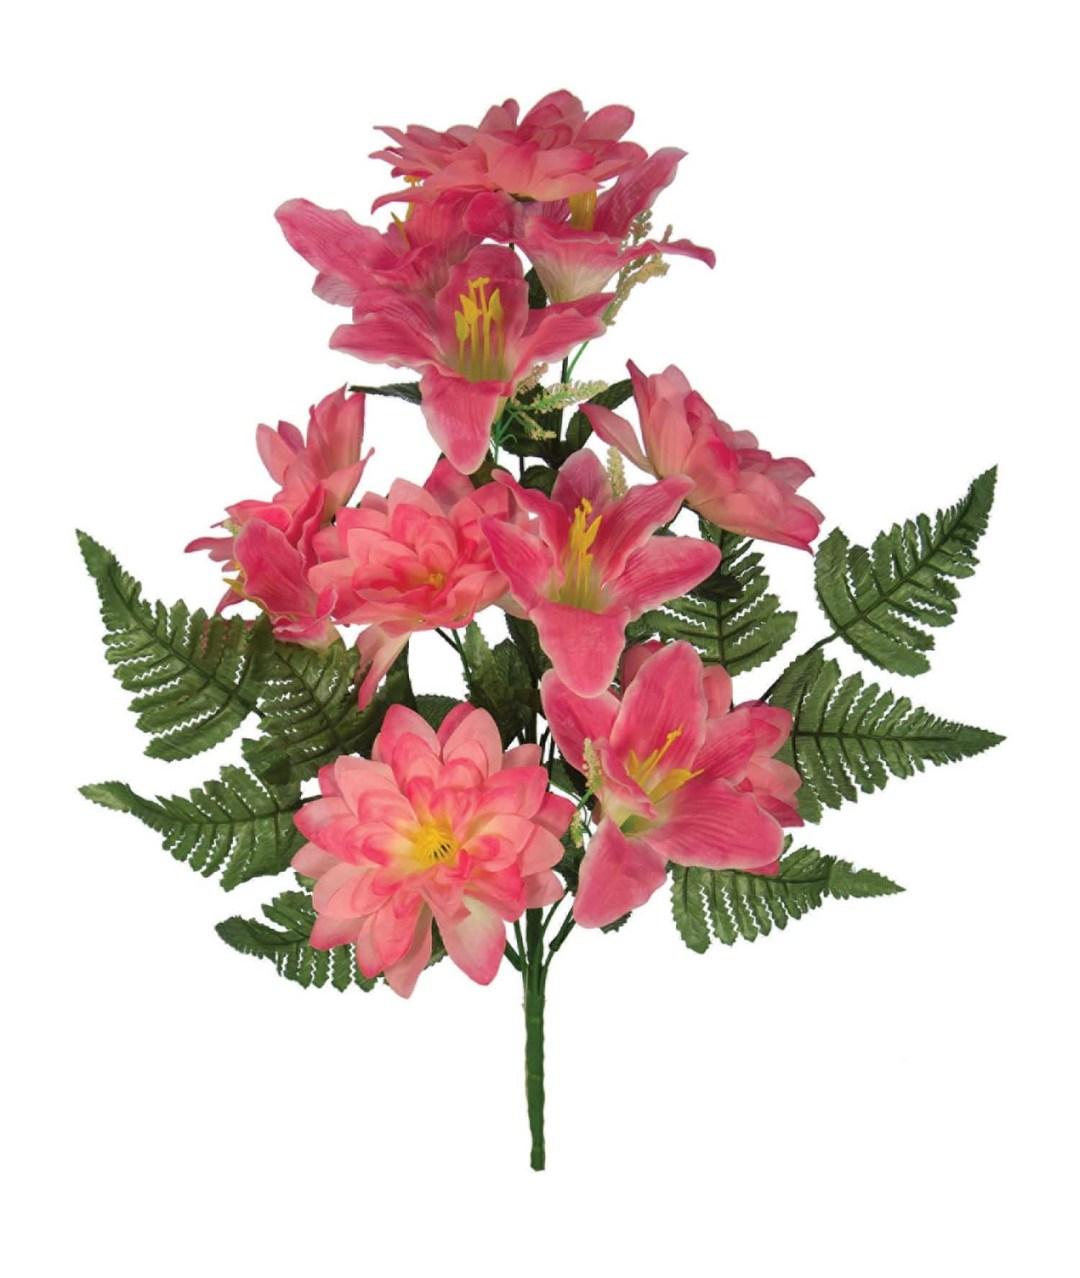 "SB3006PNK - 18"" One Sided Open Lily / Dahlia Mix x12 $3.95 each SB3006PNK"